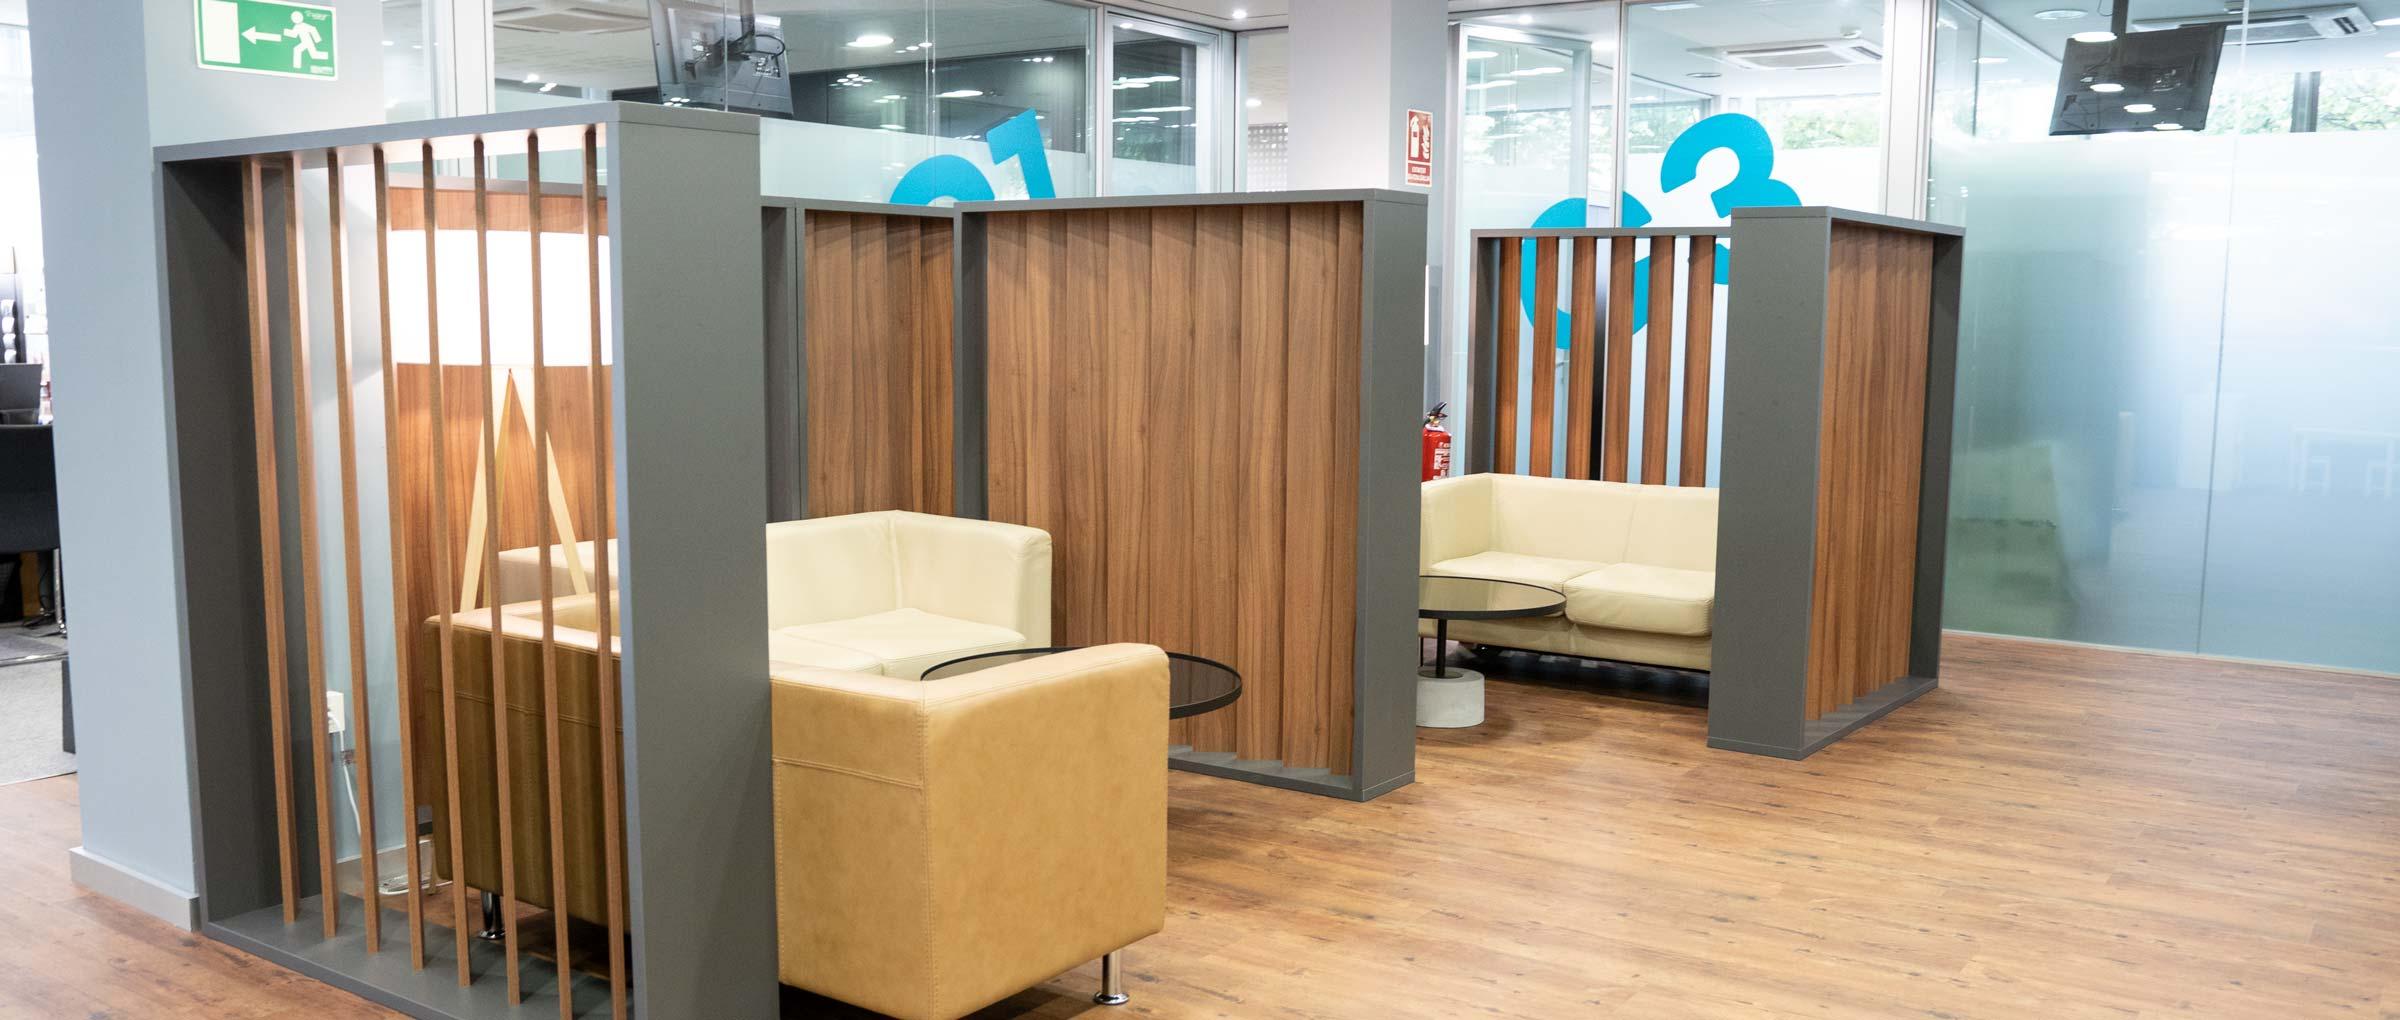 Imagen: Salle d'attente IVF Donostia